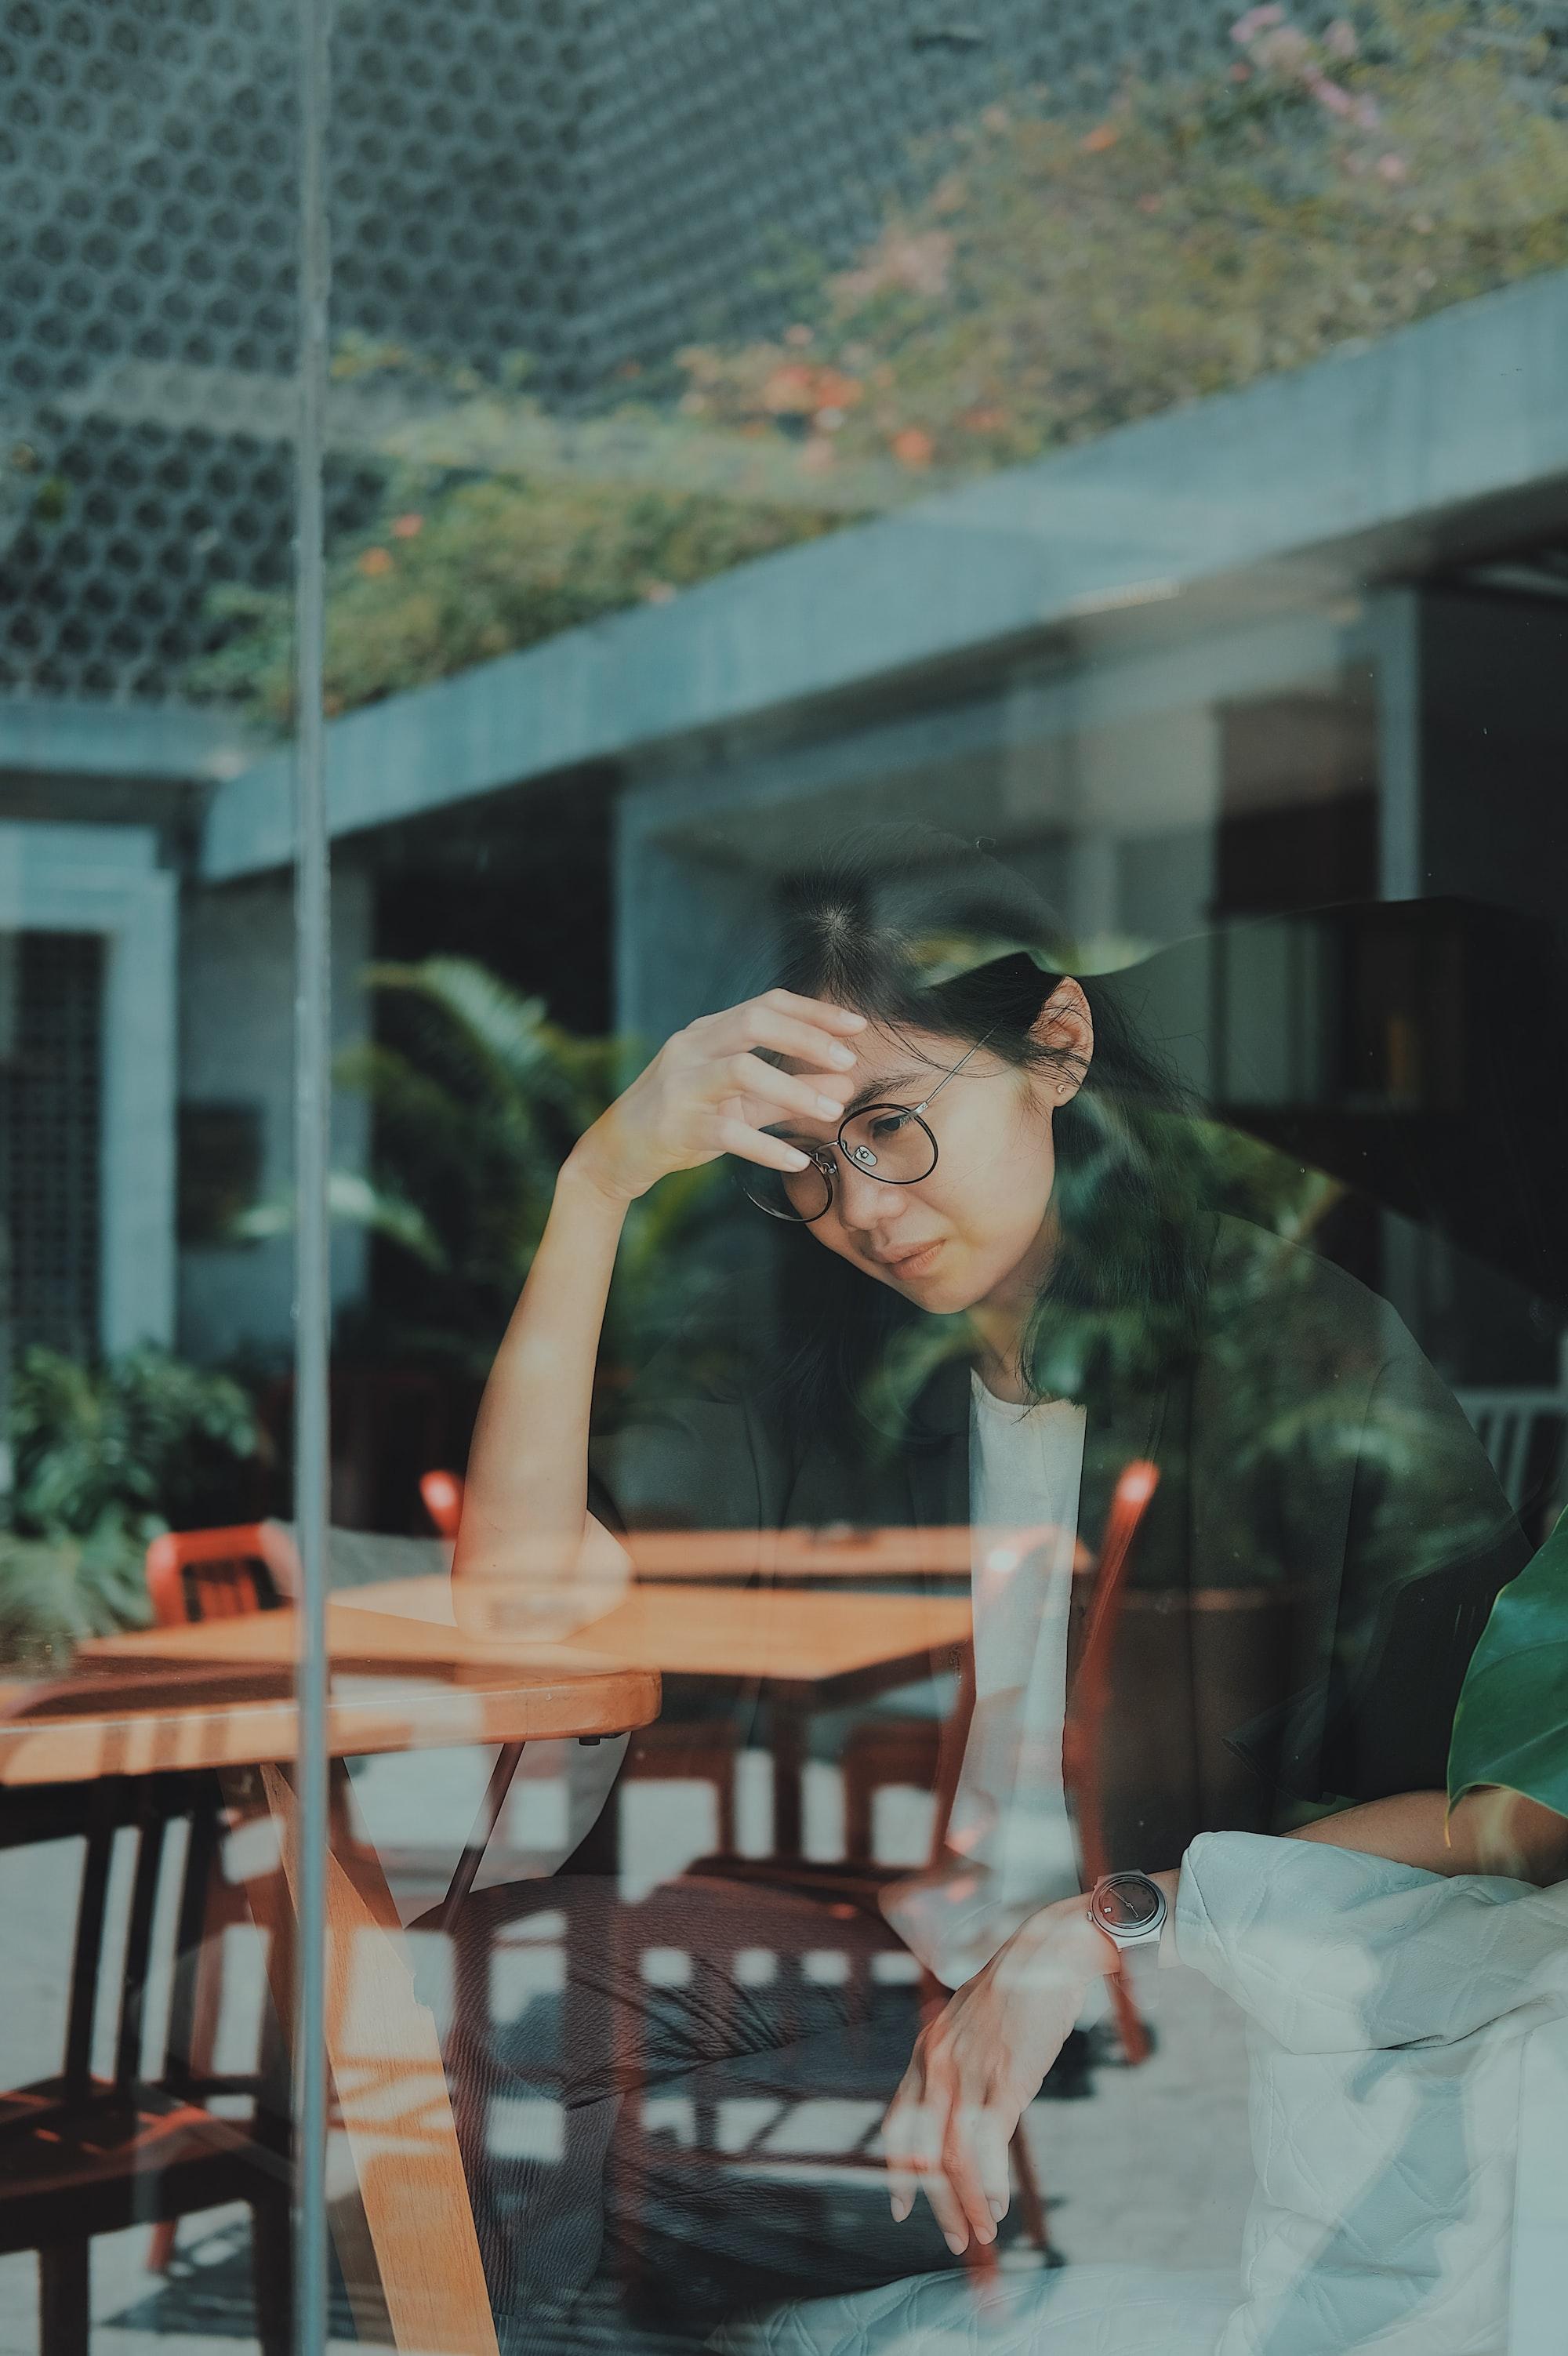 I met a girl in the coffee shop in Yogyakarta